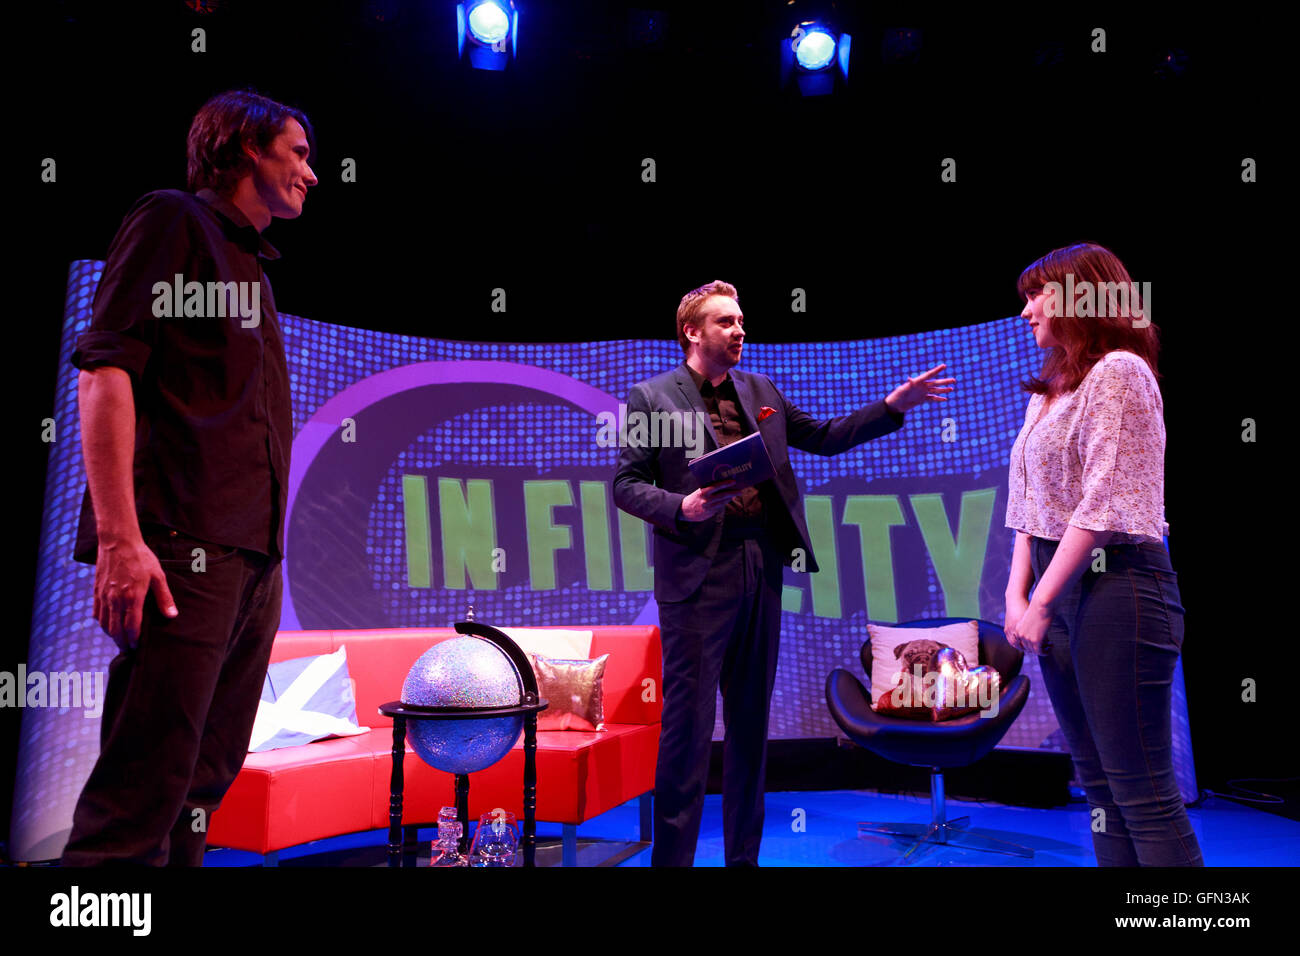 Edinburgh, UK. 1st August. Press call Edinburgh Fringe Festival present In Fidelity in Traverse Theatre Edinburgh. - Stock Image